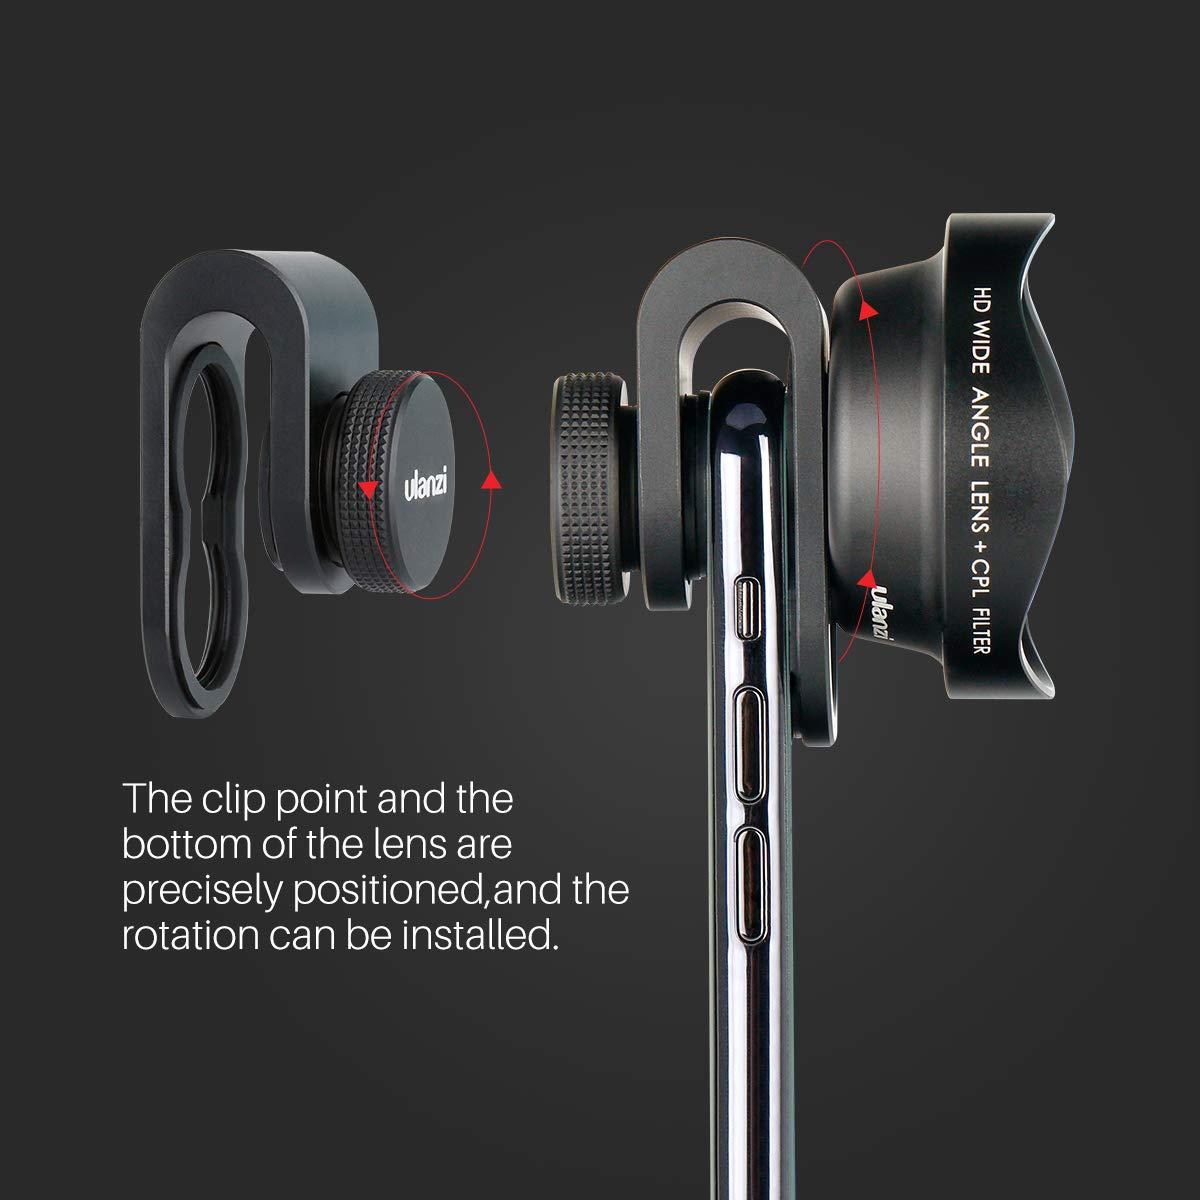 Clip de 17 mm ULANZI Lente de Ojo de pez Lente de c/ámara para tel/éfono de 238 /° Universal para iPhone 11 Pro MAX X XR XS MAX 8 7 6S Plus Samsung Galaxy S10 S9